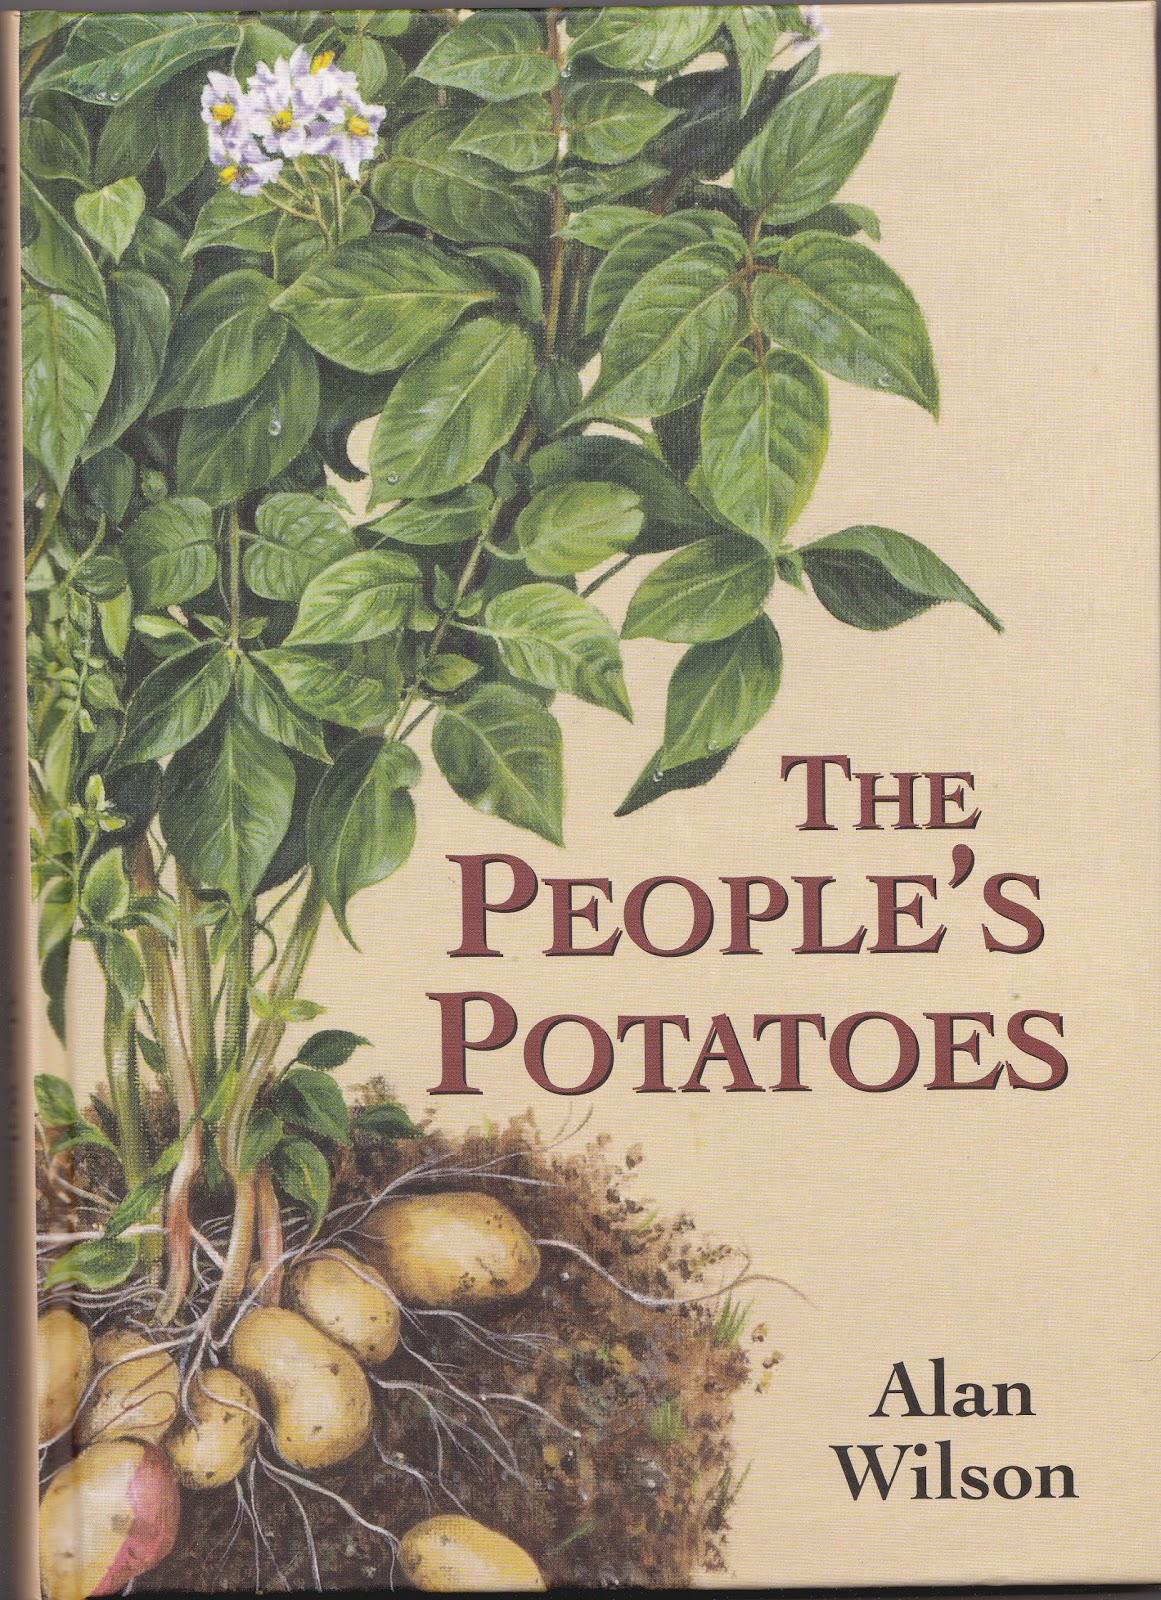 Michael Nicholson: Famine novel changed my mind on England's guilt